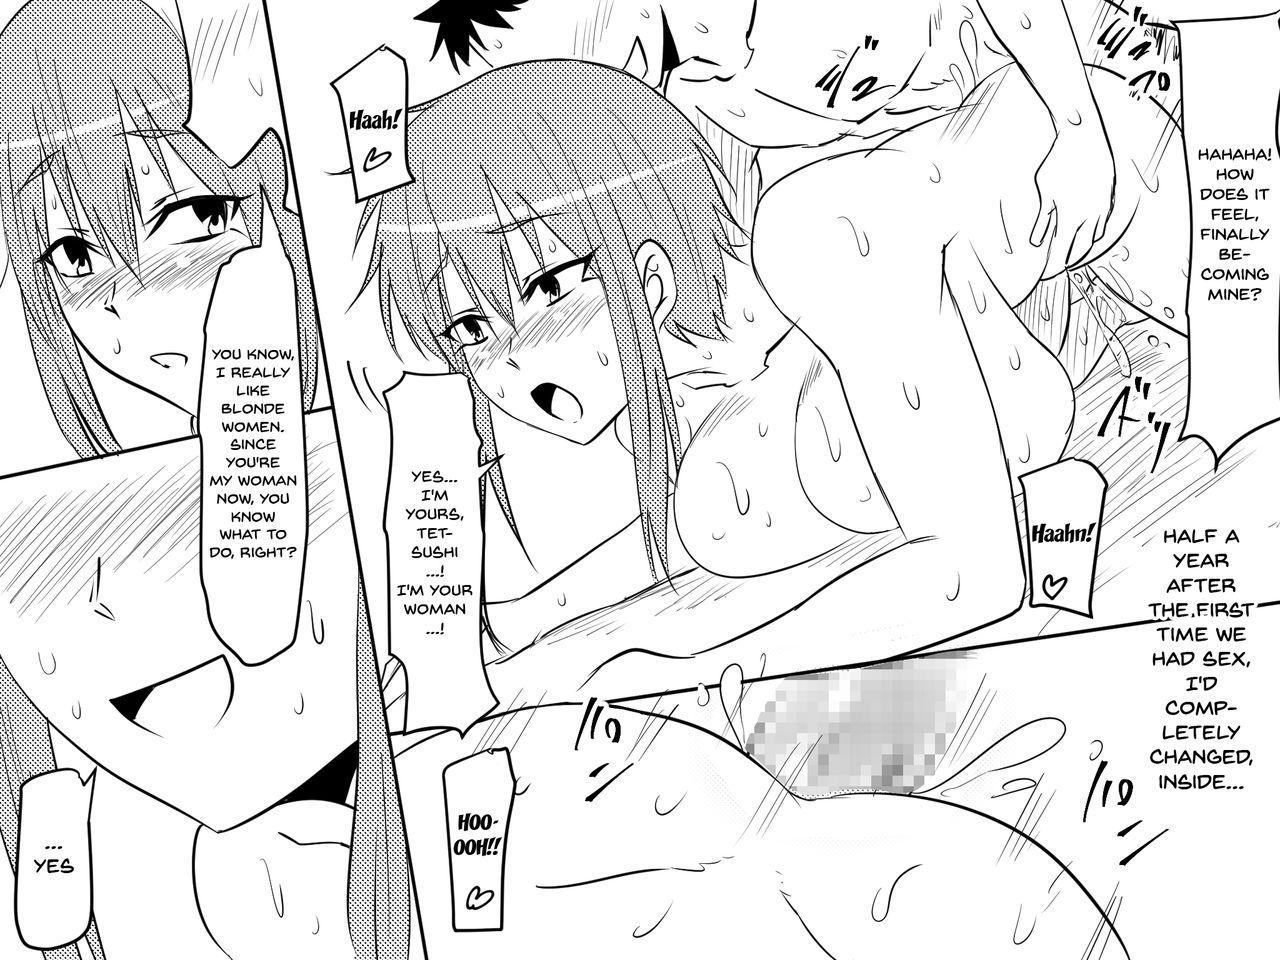 [Mikezoutei] Netorare Haha ~Kachiki de Kimottama no Okaa-san ga Boku o Ijimeru Aitsu no Onna ni Naru Hanashi~   Mom NTR ~A Story Of How My Gutsy Mom Ended Up Becoming My Bully's Plaything~ [English] {Doujins.com} 64